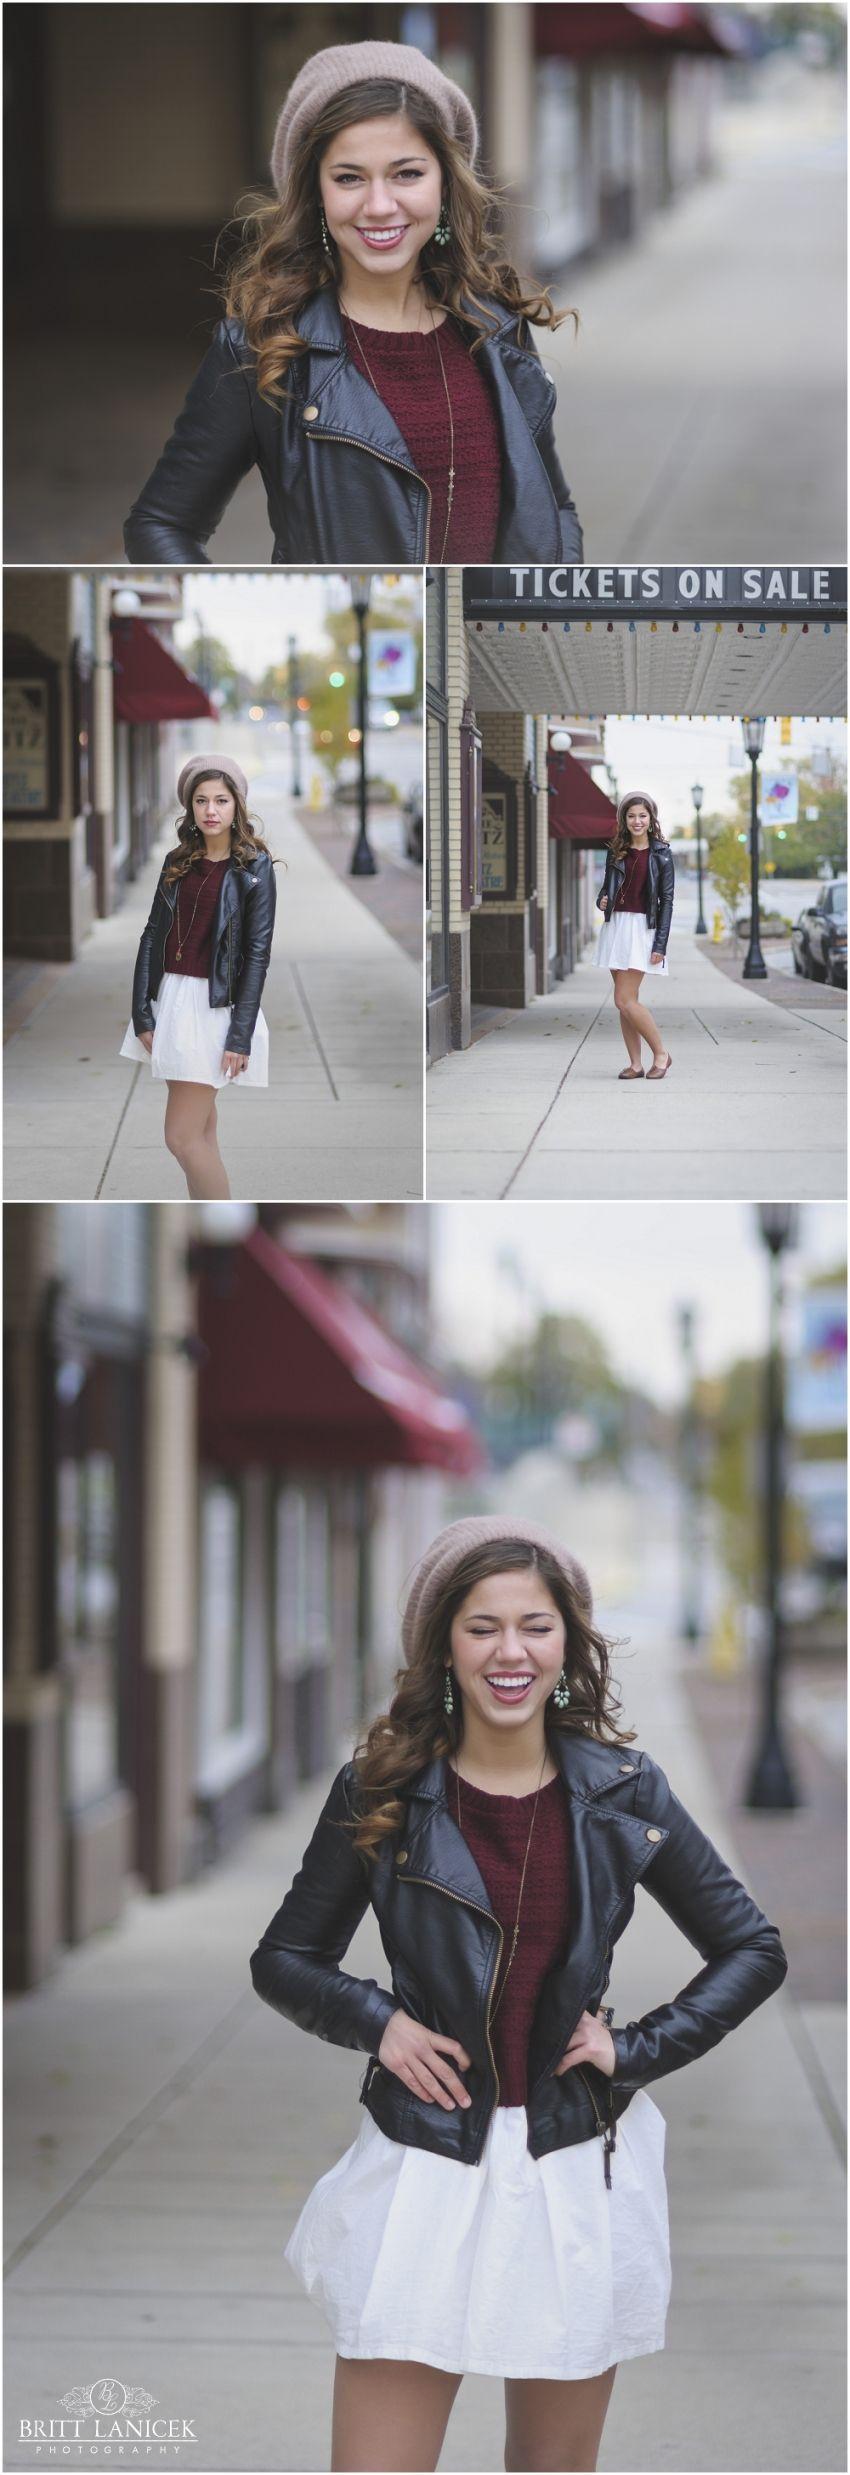 Modern Senior Pictures | Downtown Senior Portraits | Custom Senior Pictures by Britt Lanicek Photography in Tiffin, Ohio. http://www.brittlanicekphotography.com